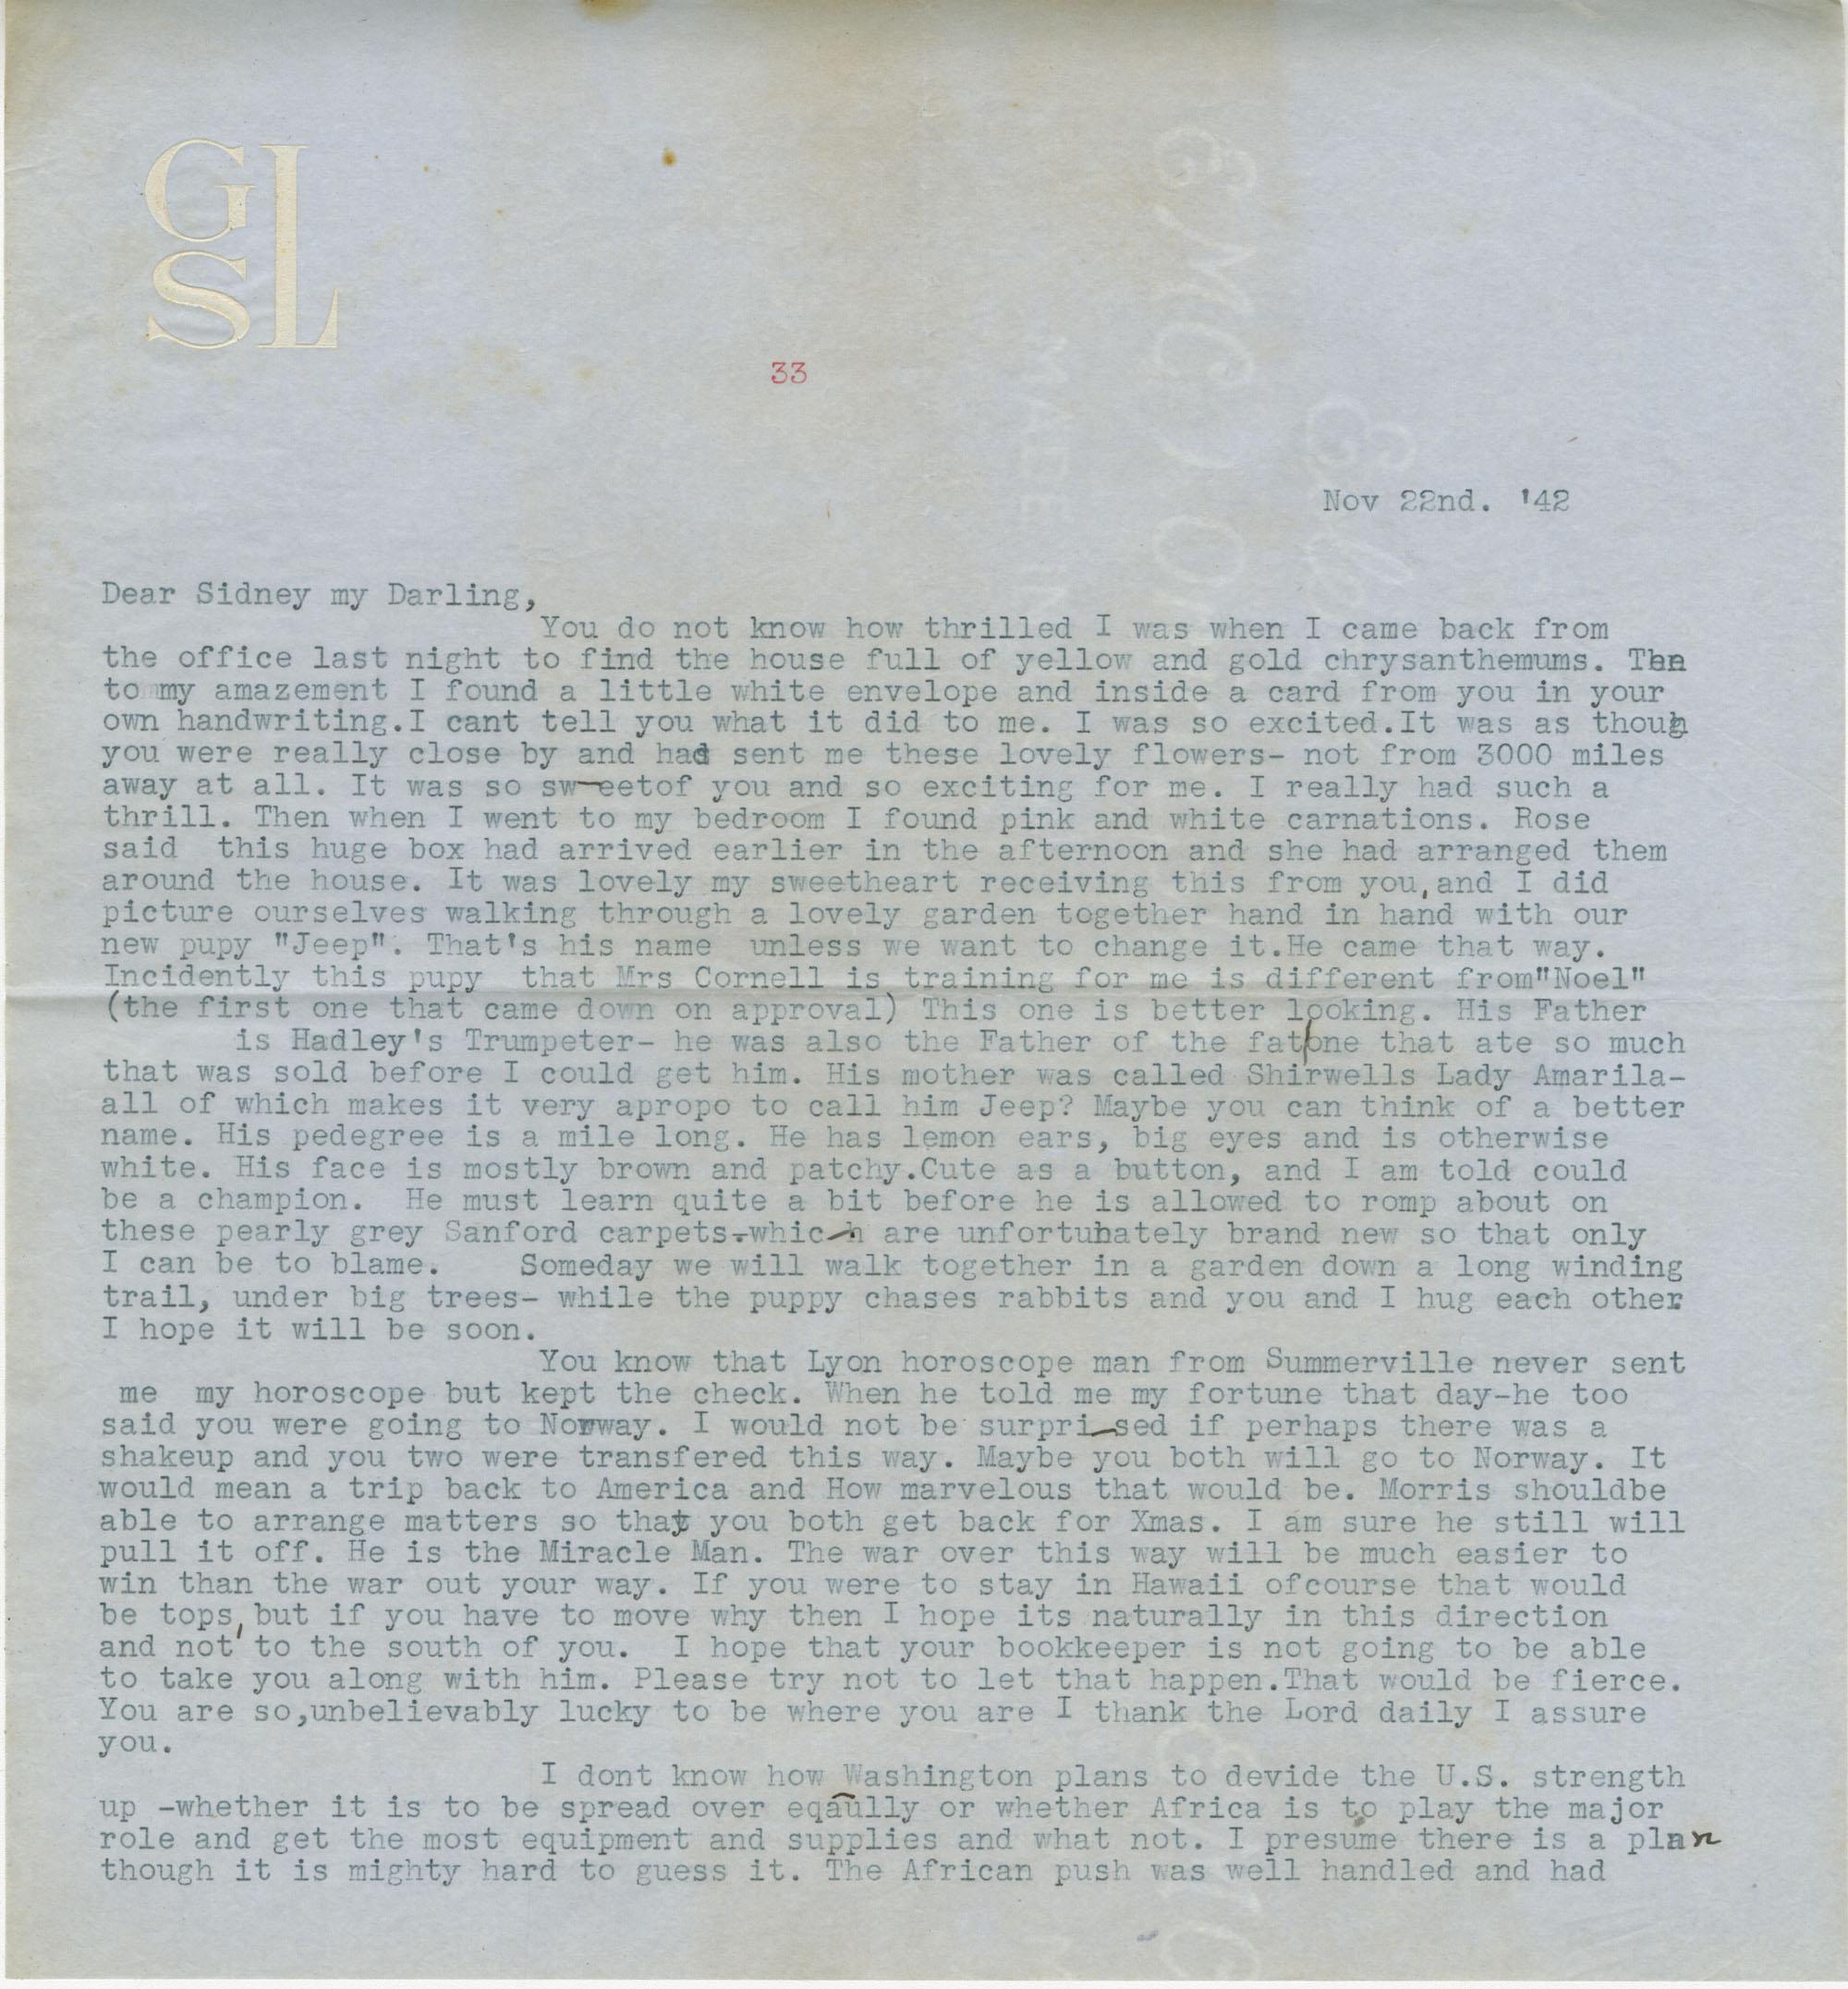 Letter from Gertrude Sanford Legendre, November 22, 1942